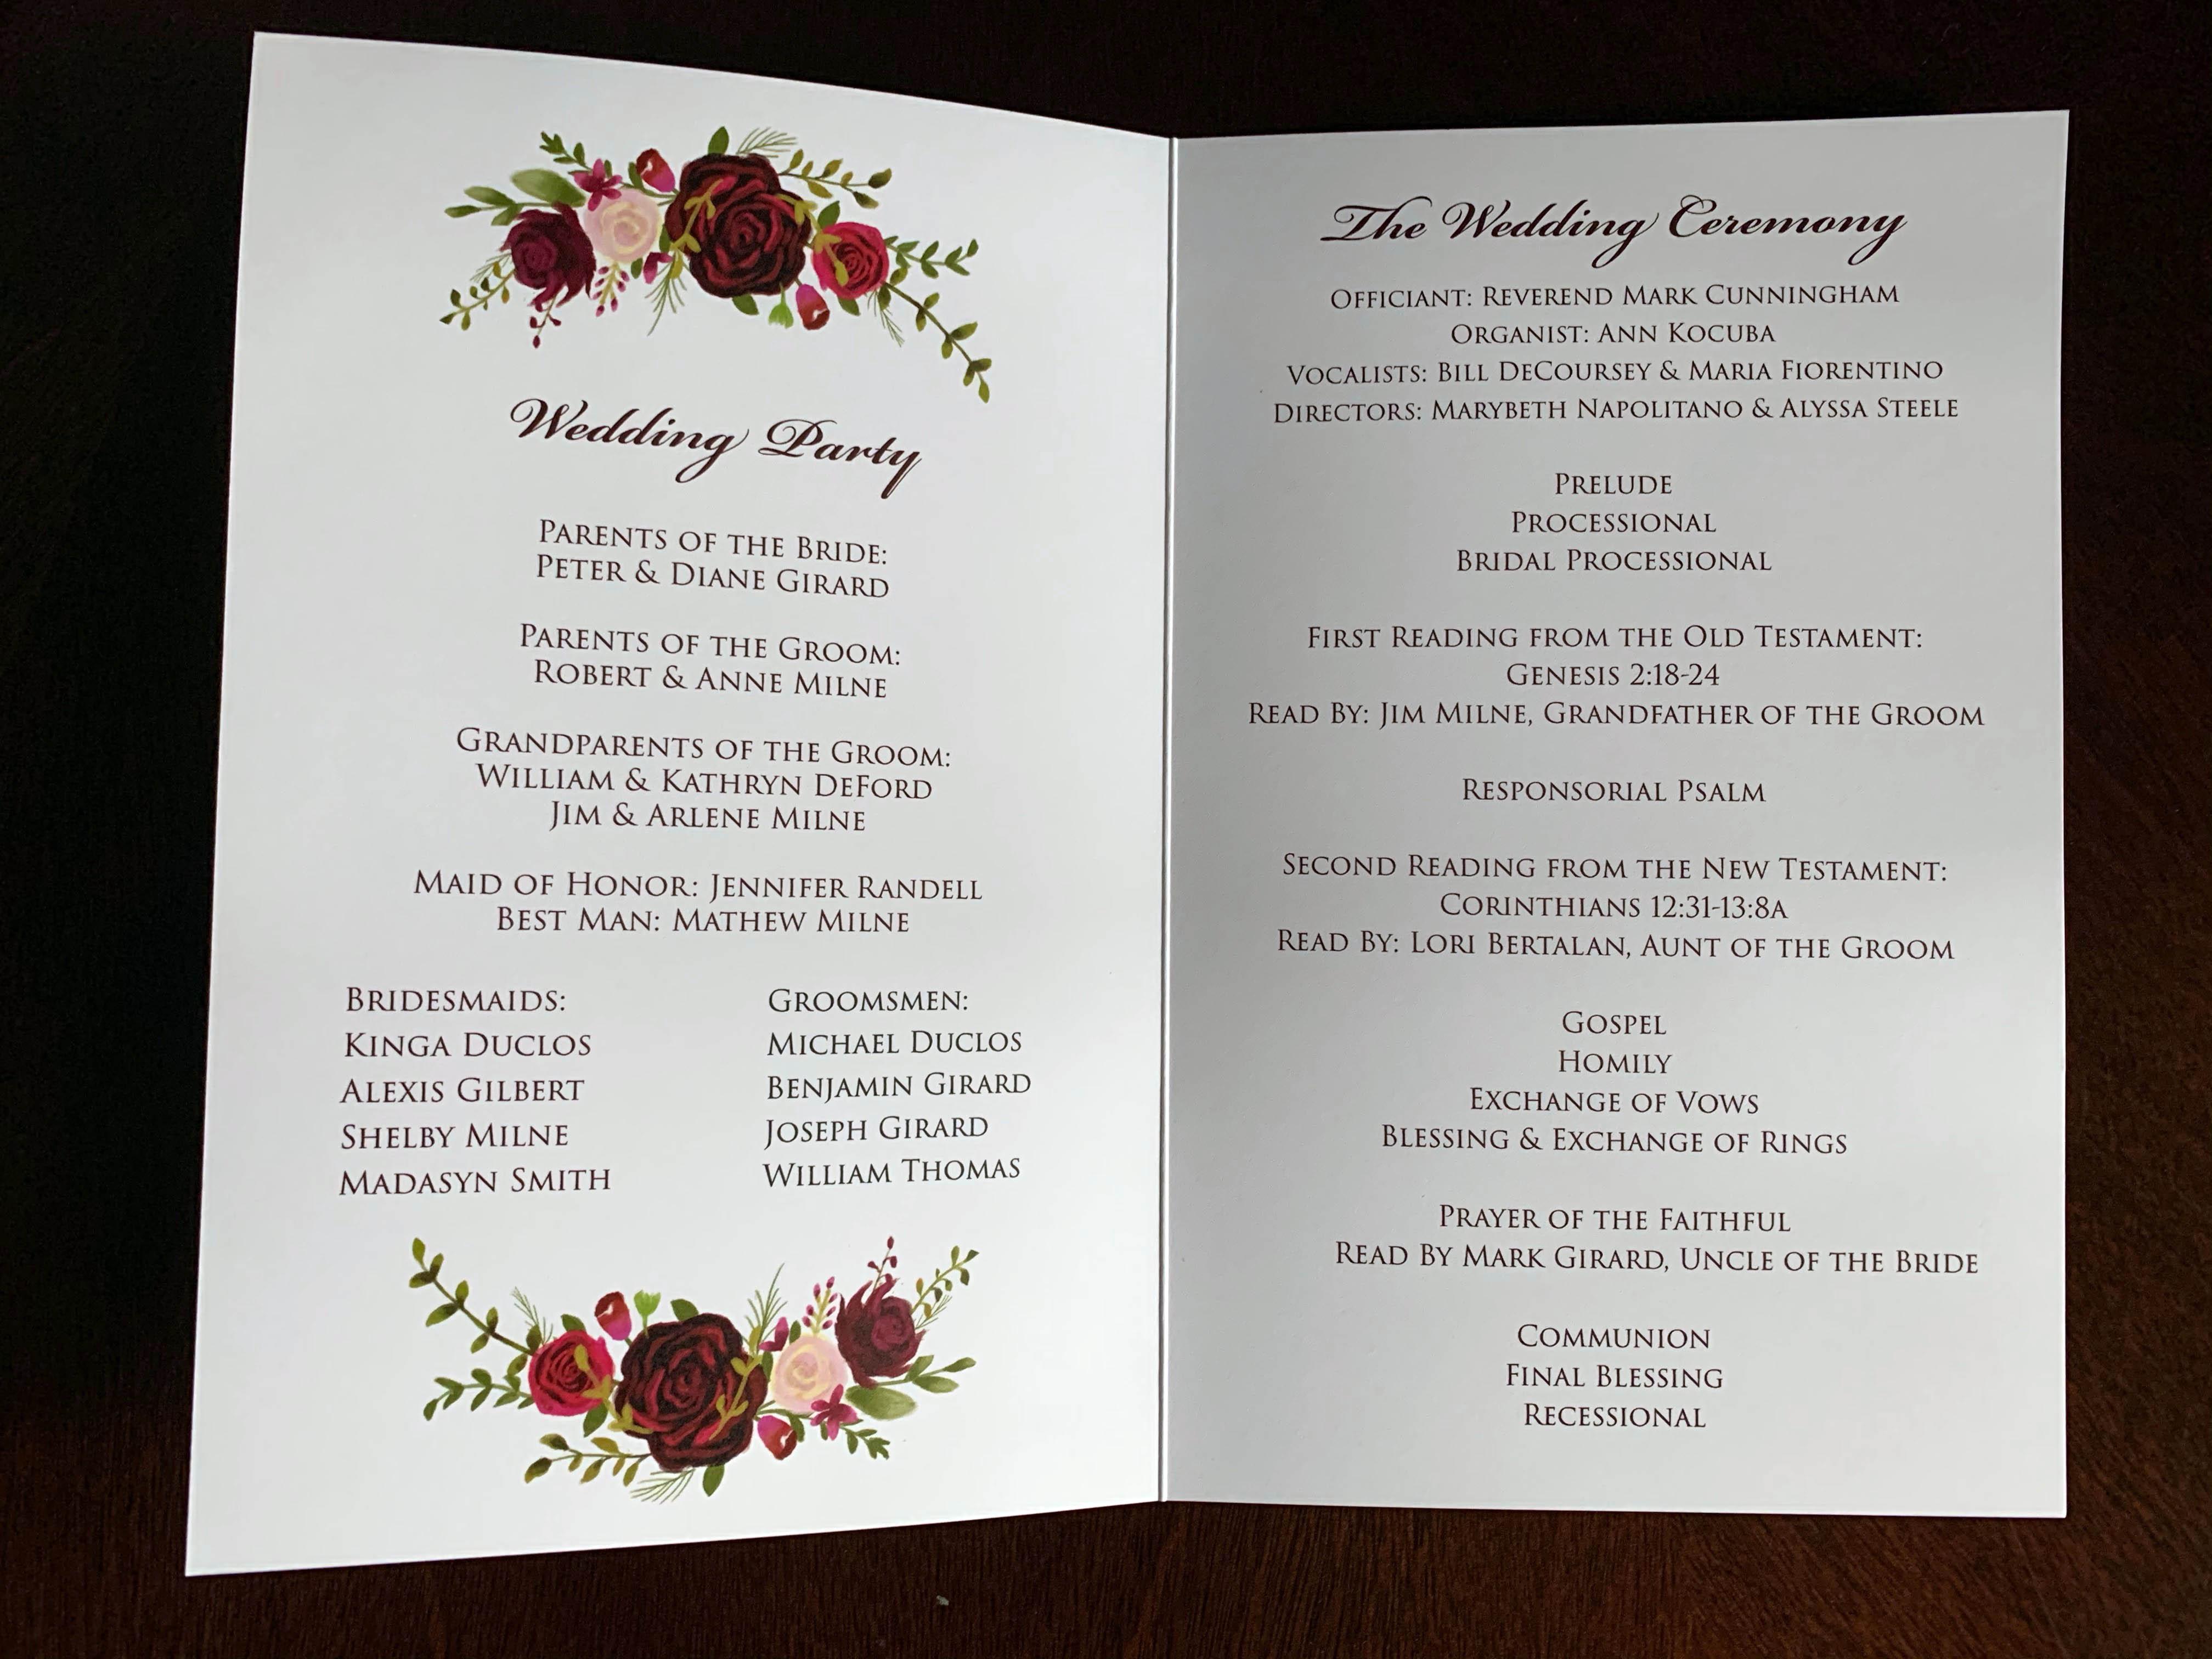 Ceremony Program (inside)